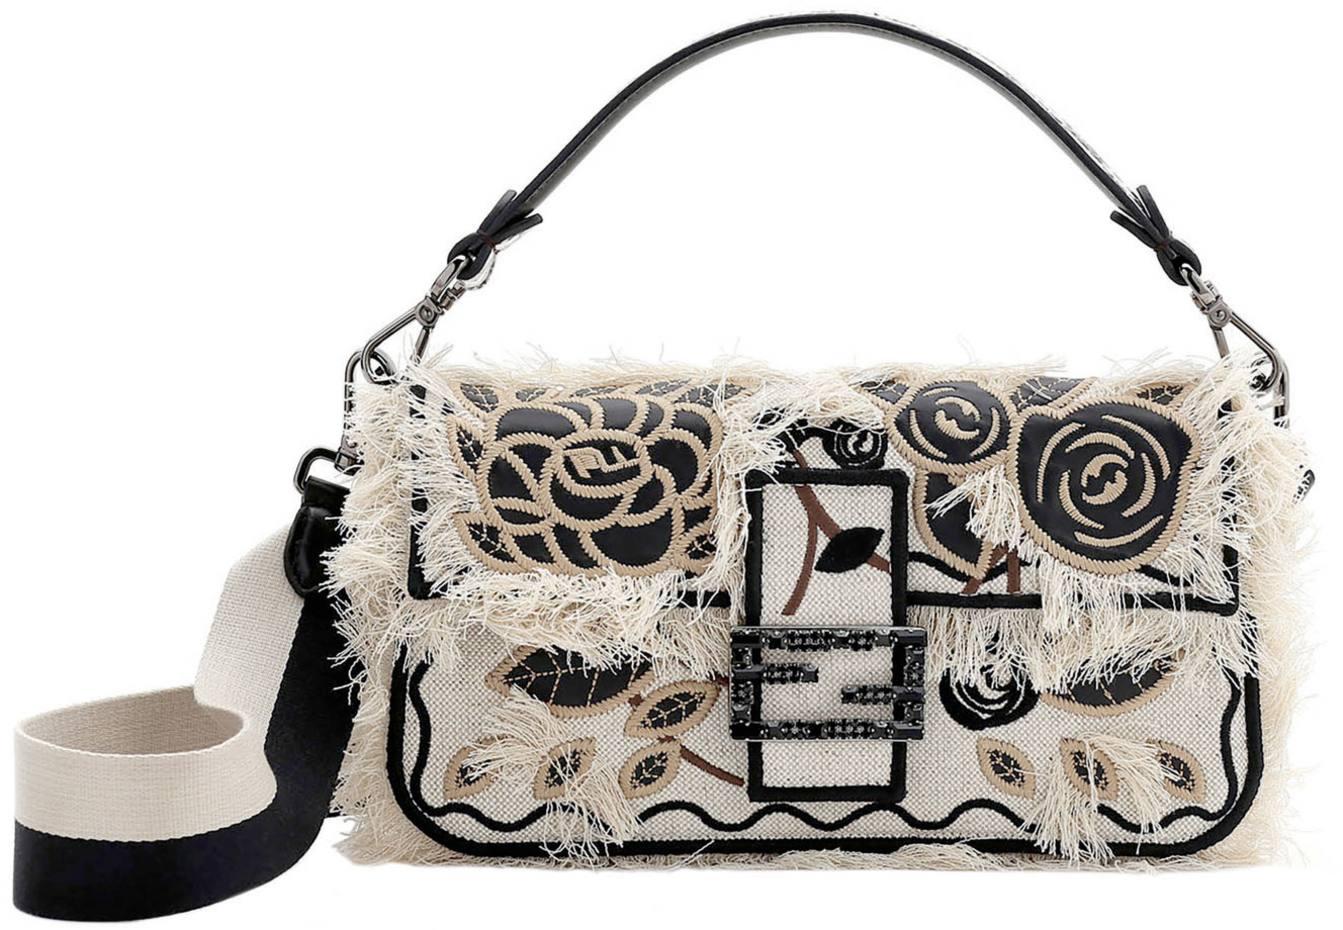 4e48b376c9 A deliciously decorative Fendi Baguette | How To Spend It